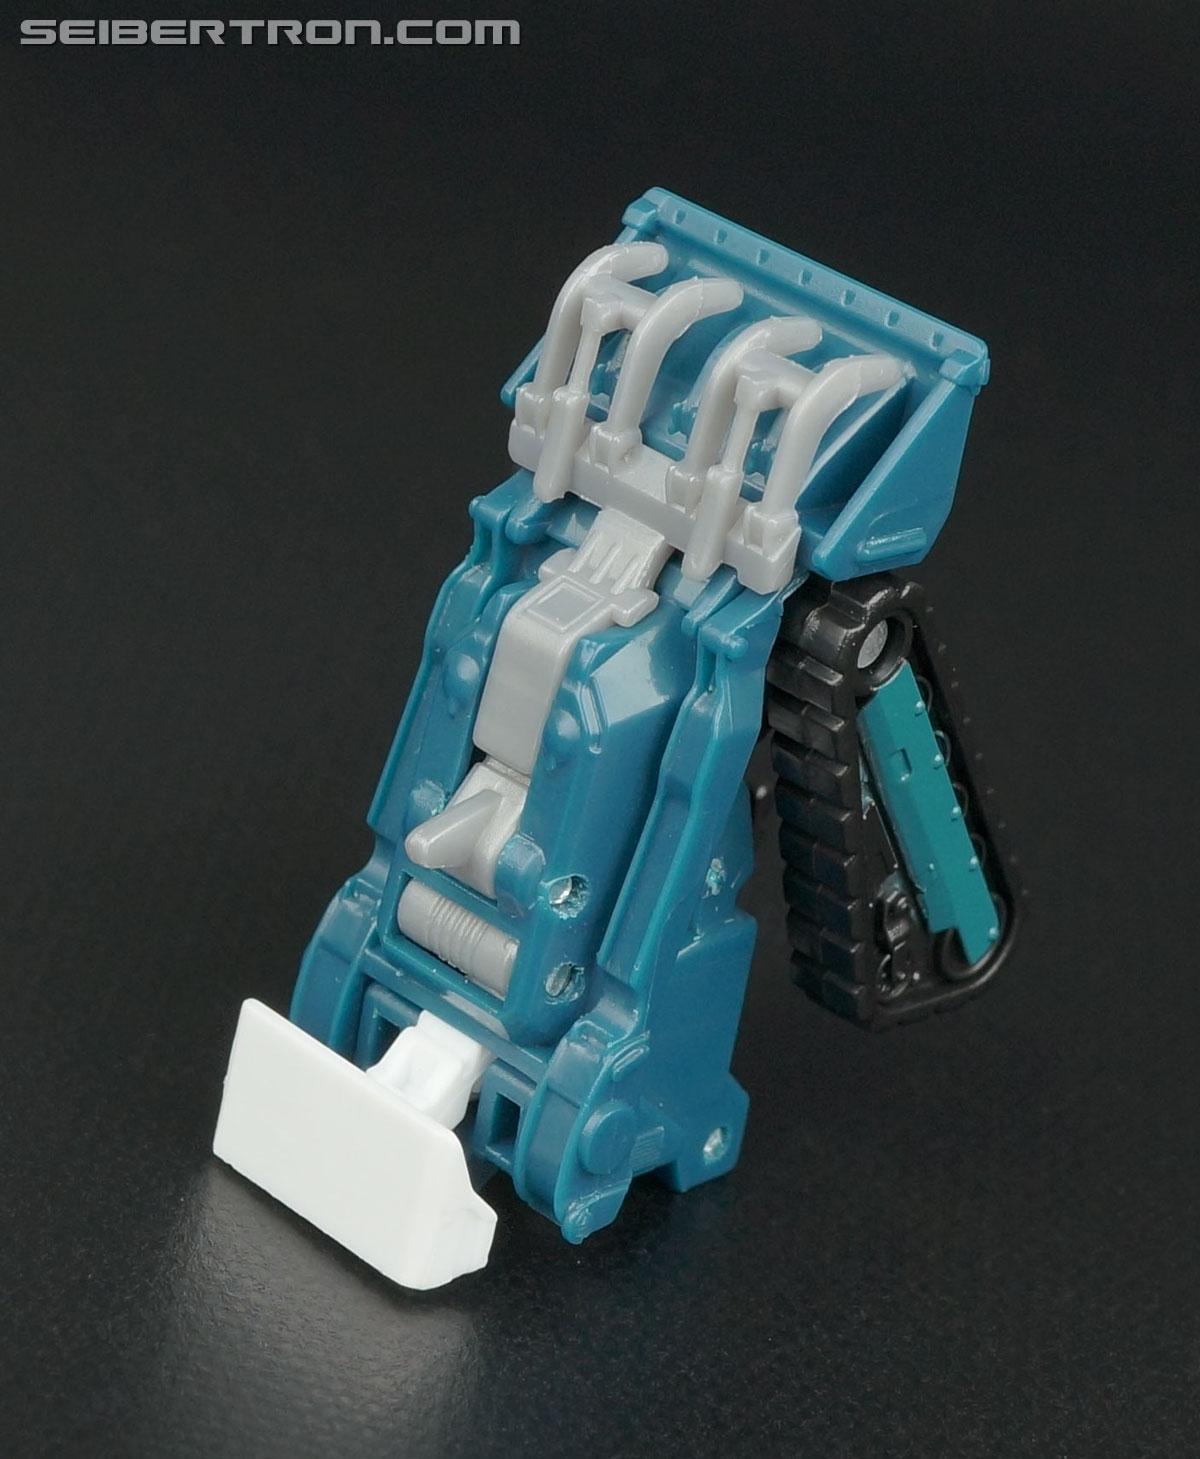 Transformers Legends Groundshaker (Image #46 of 66)